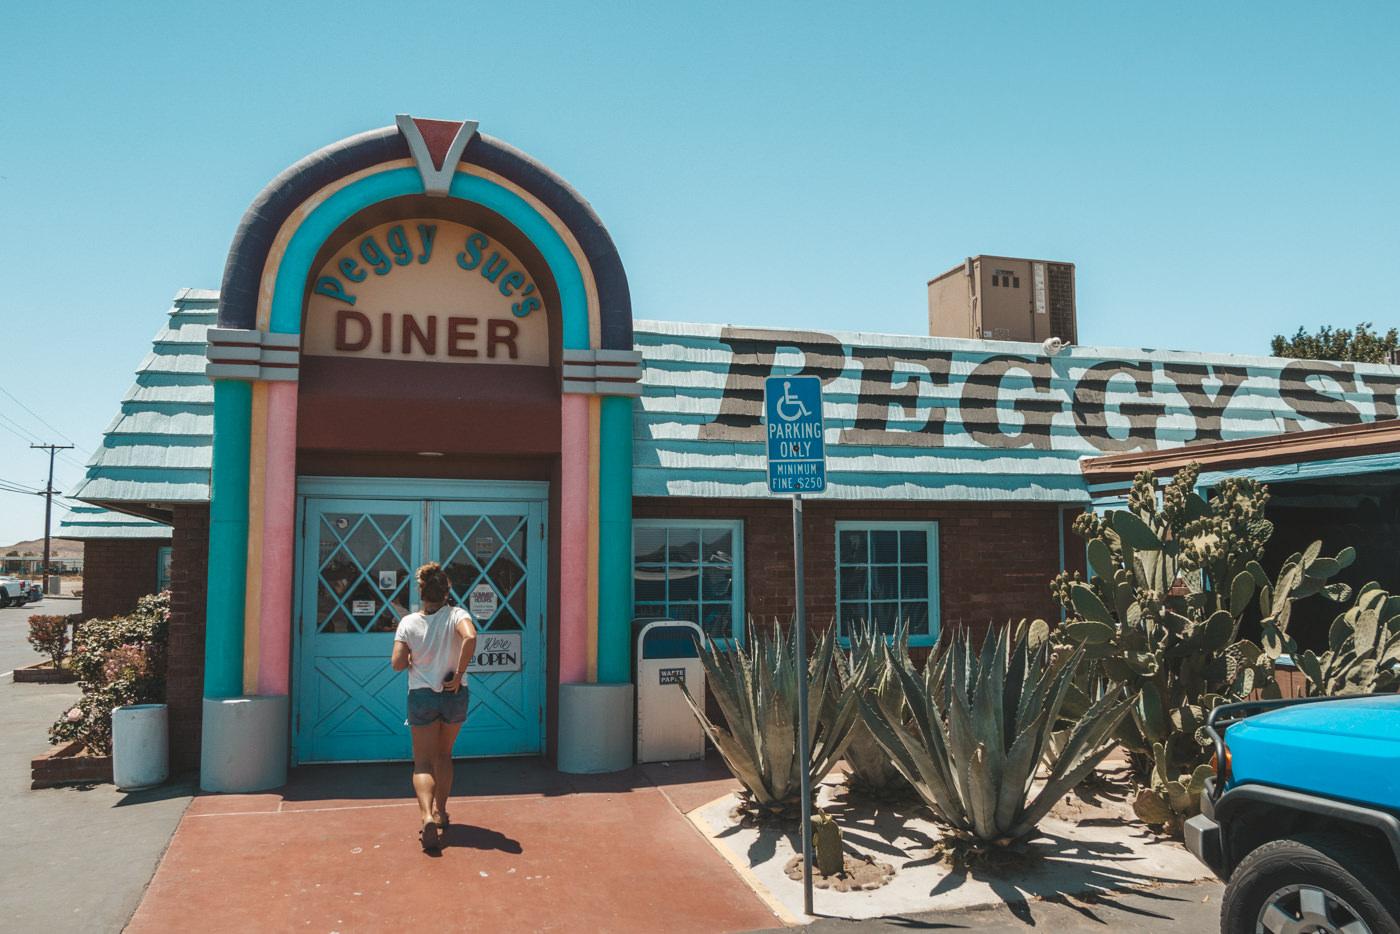 Peggy Sue's 50' Diner